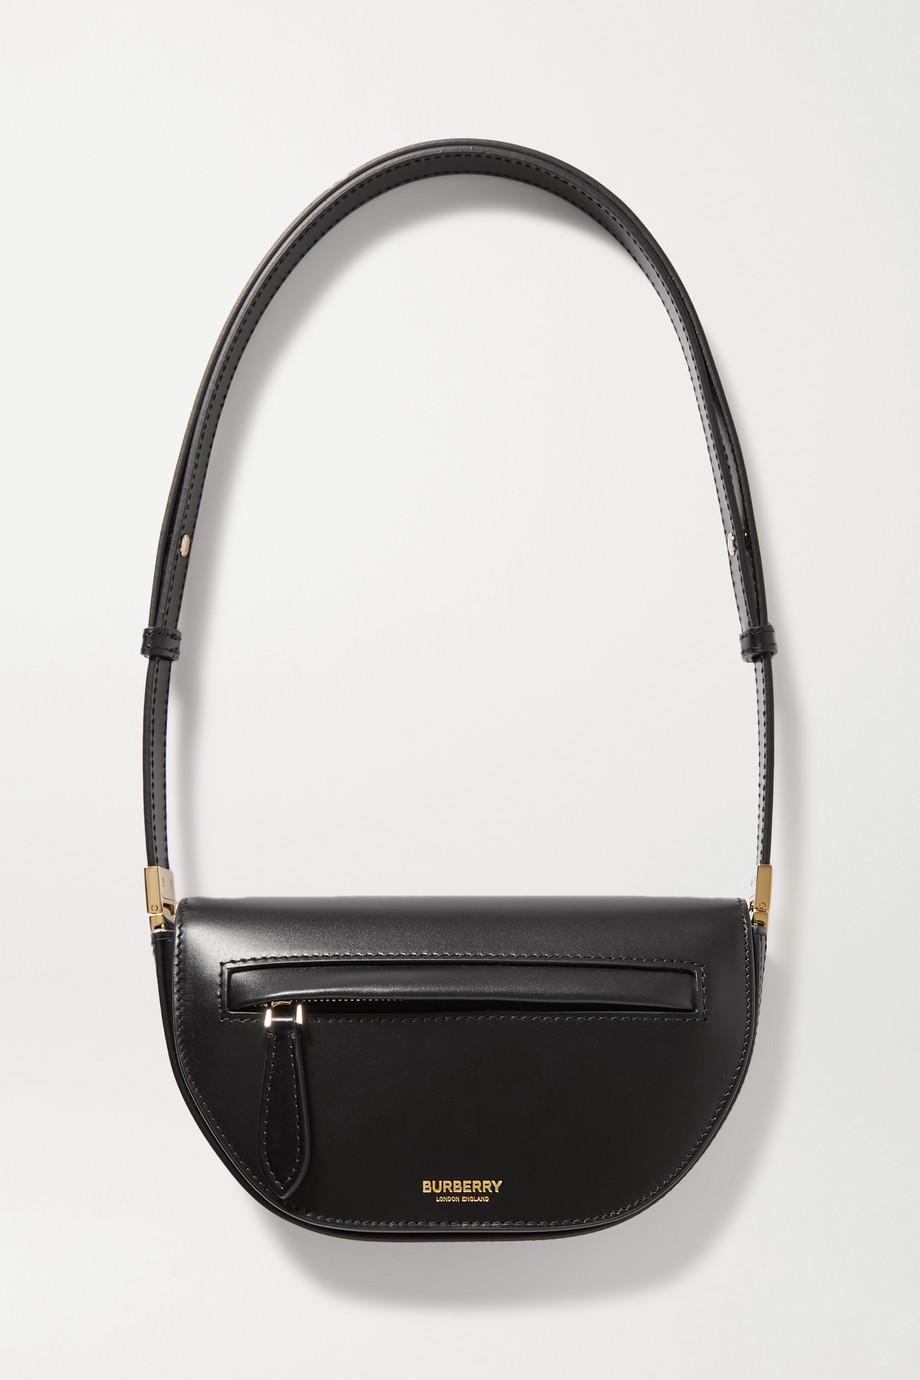 Burberry Mini leather shoulder bag